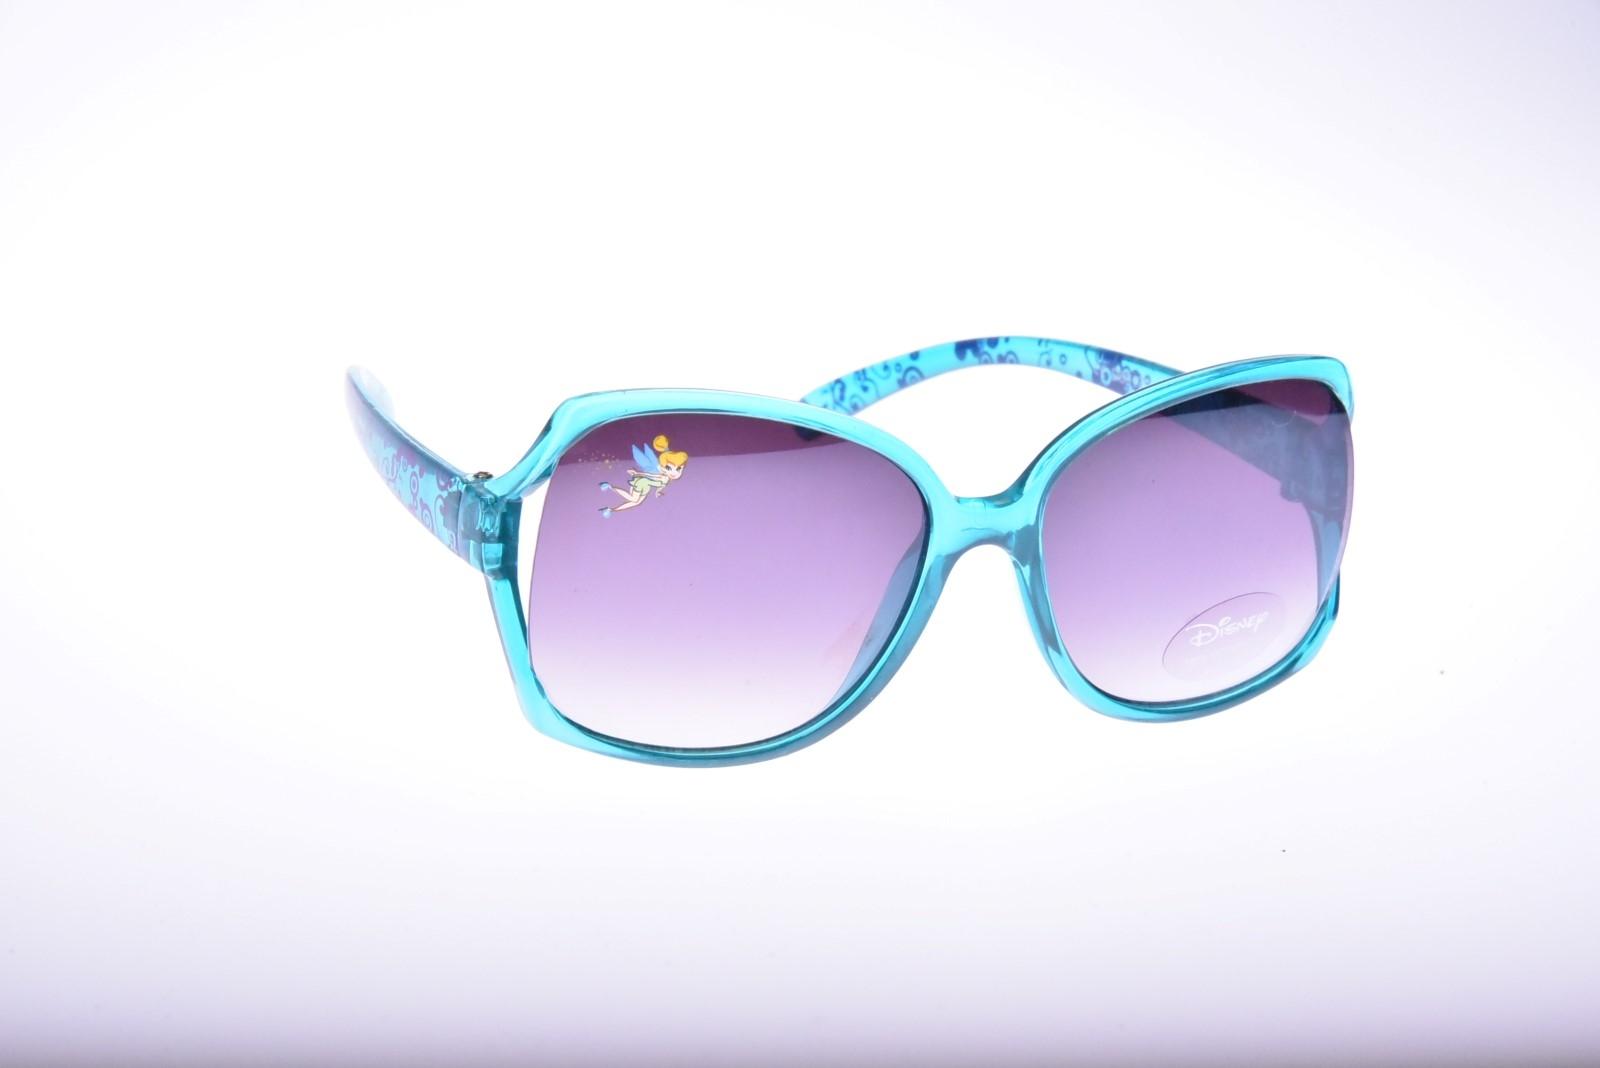 Polaroid Disney D6917B - Slnečné okuliare pre deti 8-12 r.